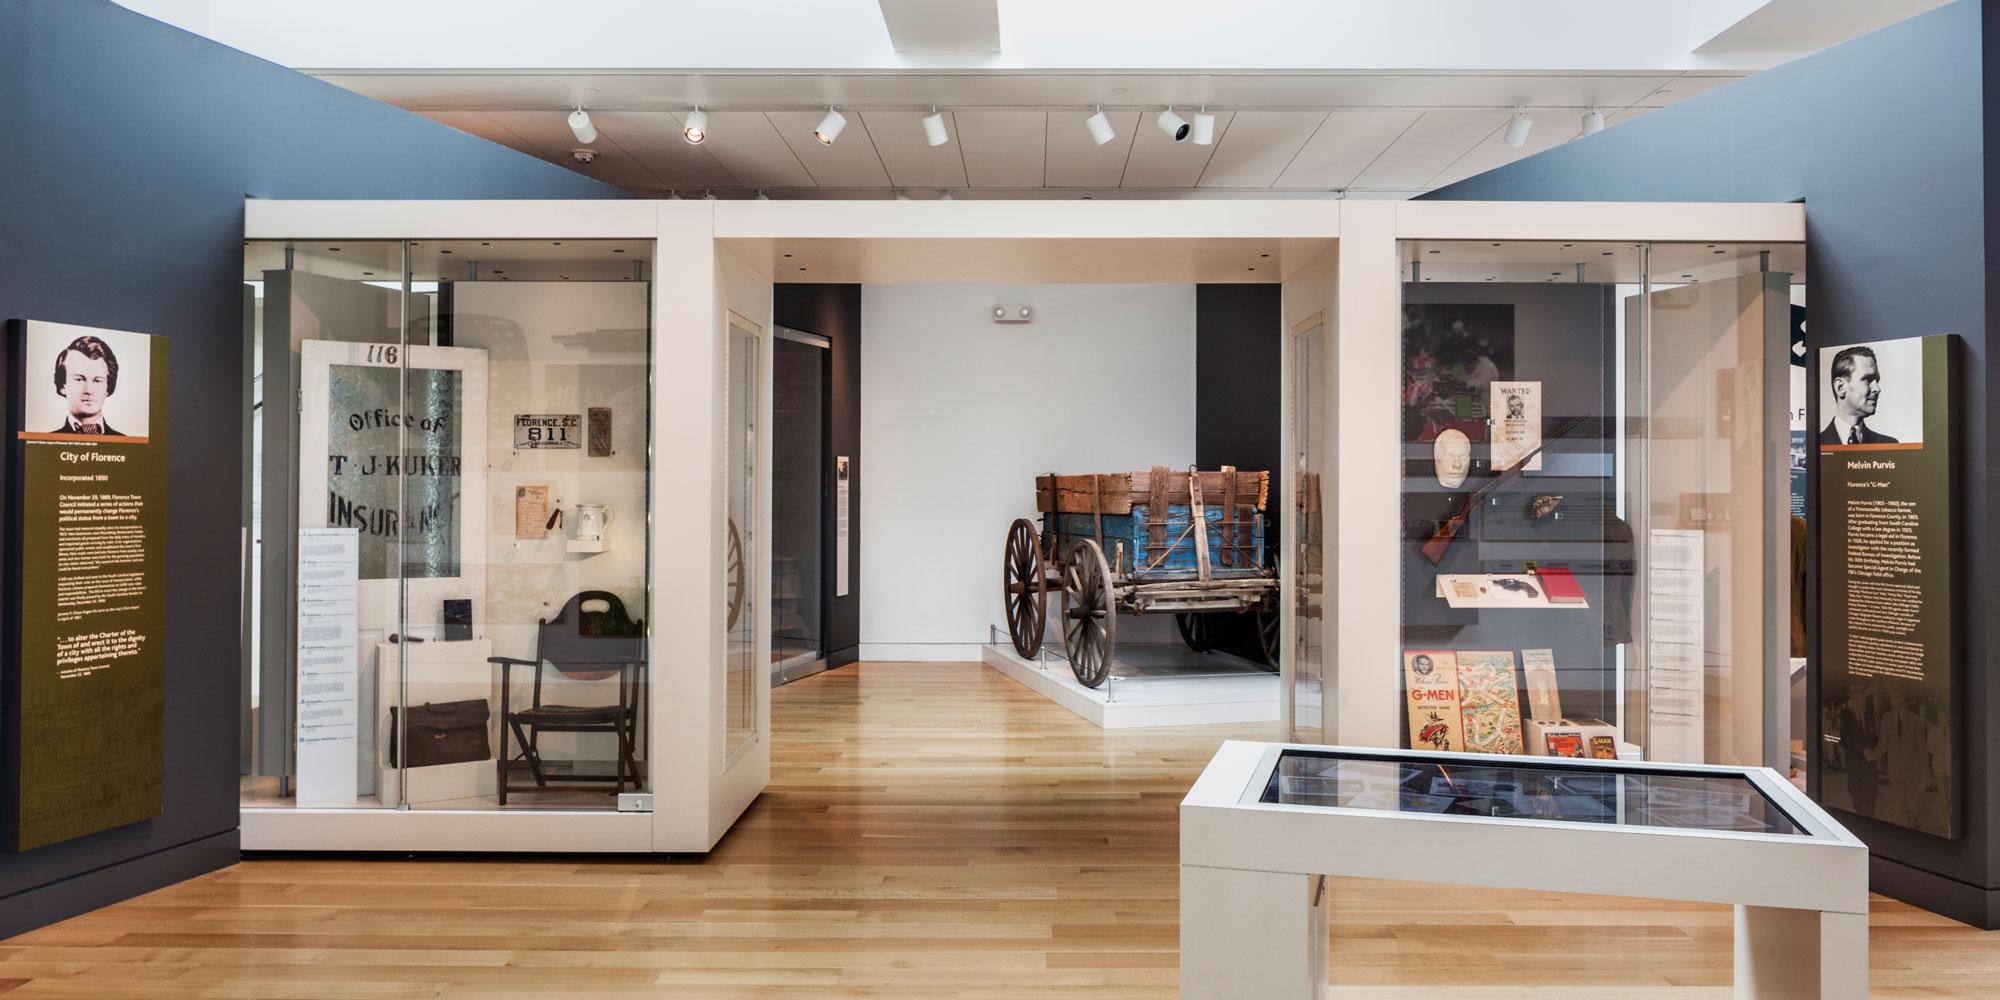 The Pee Dee History Gallery